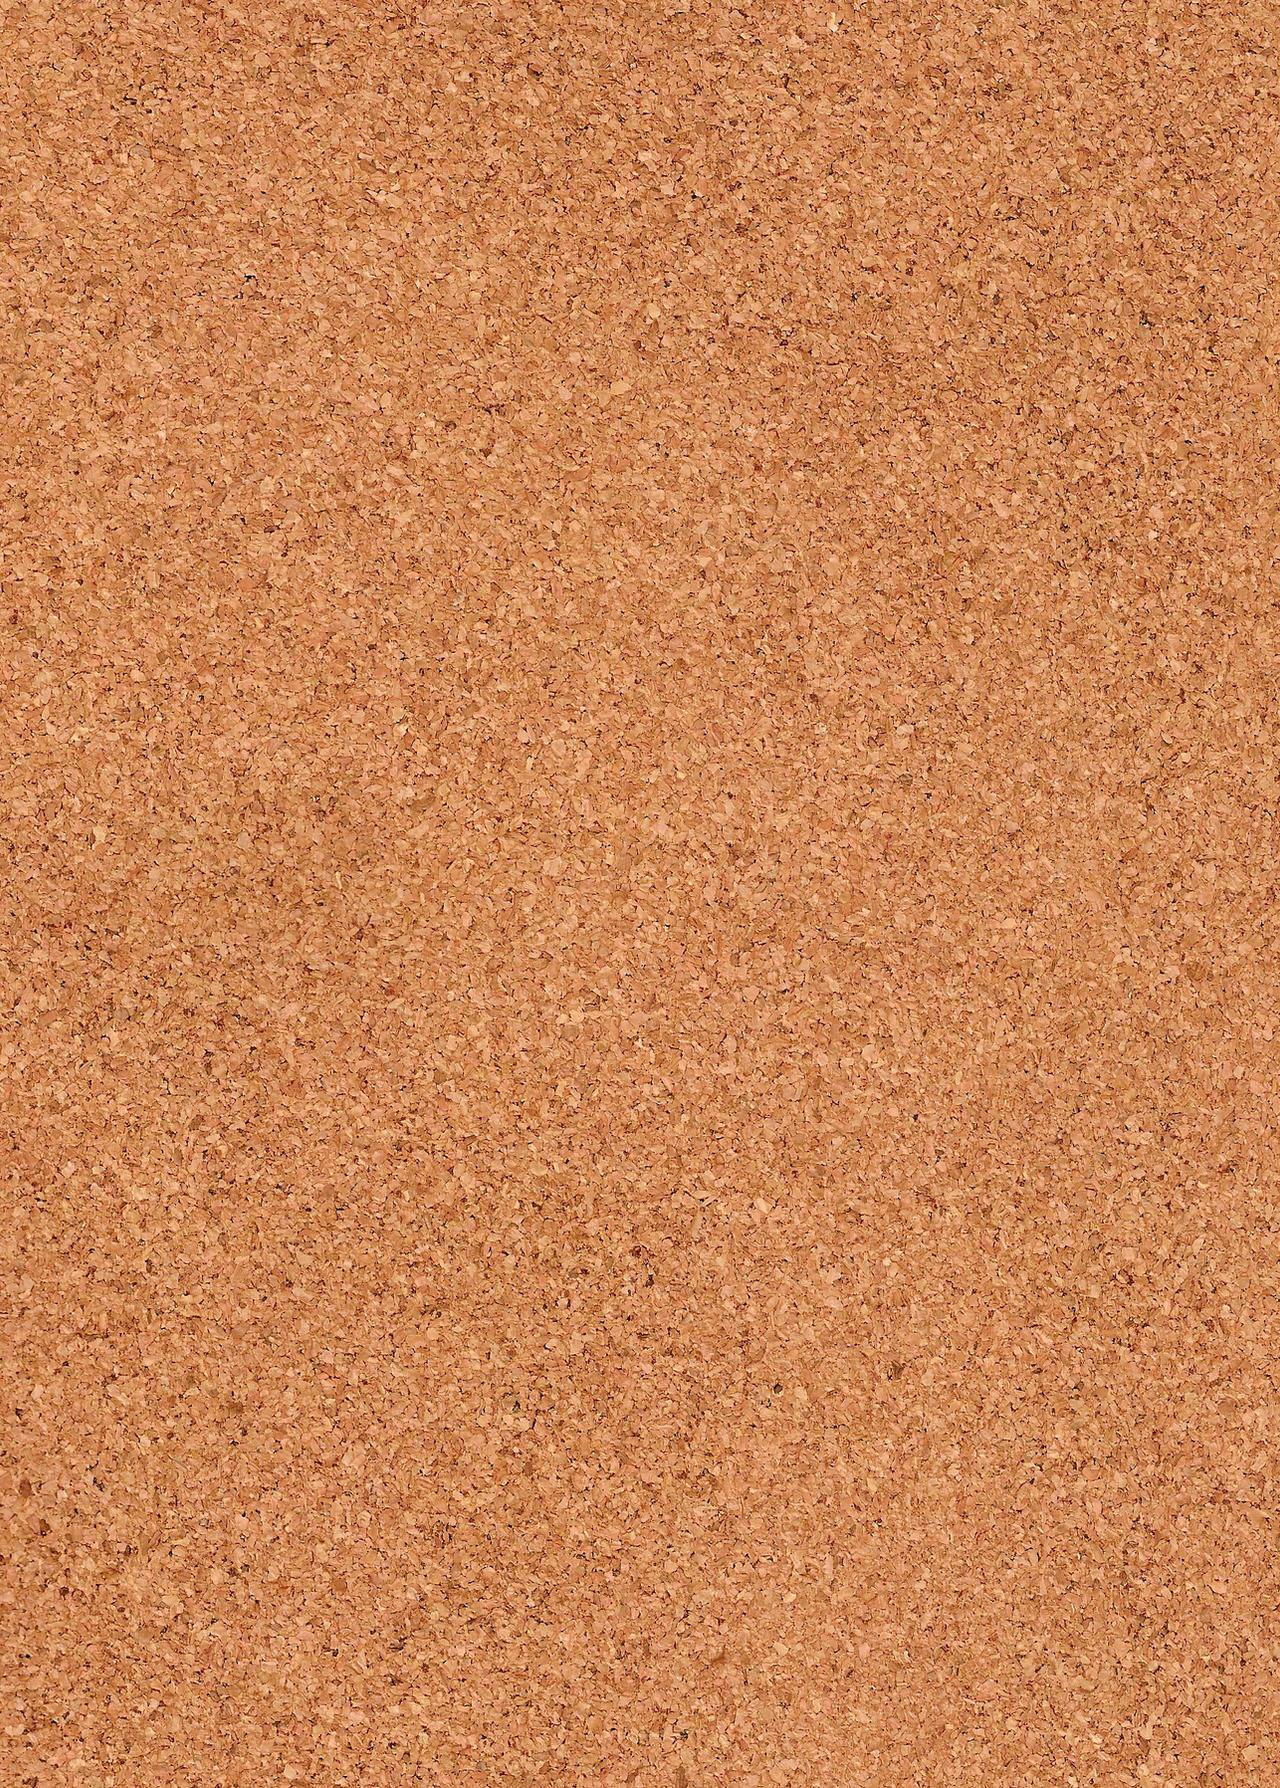 Corkboard Wood Cork Composite by Enchantedgal-Stock on DeviantArt